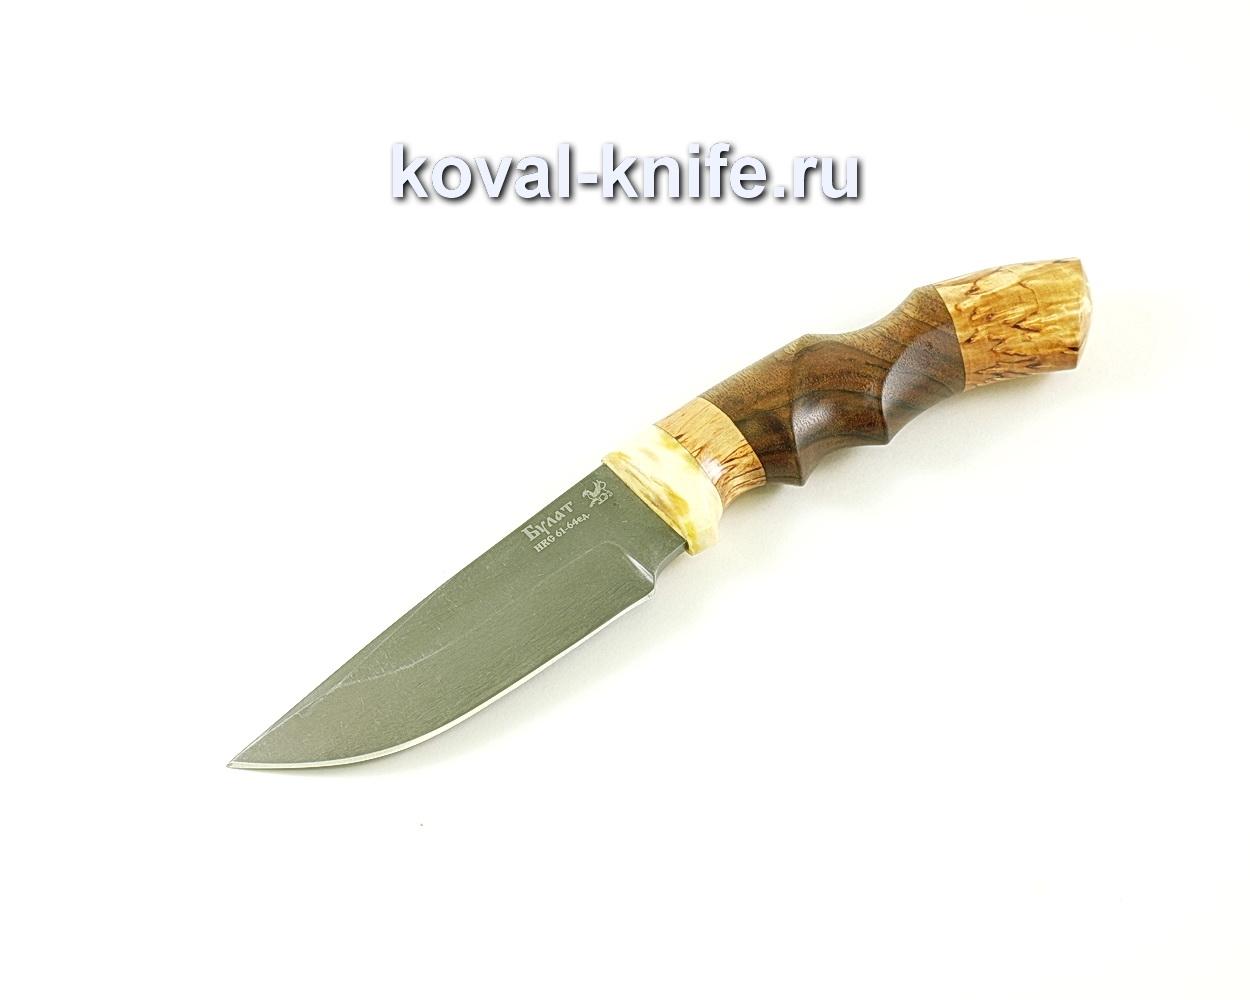 Нож Норвег (сталь Булат), рукоять кость, карелка, орех A050